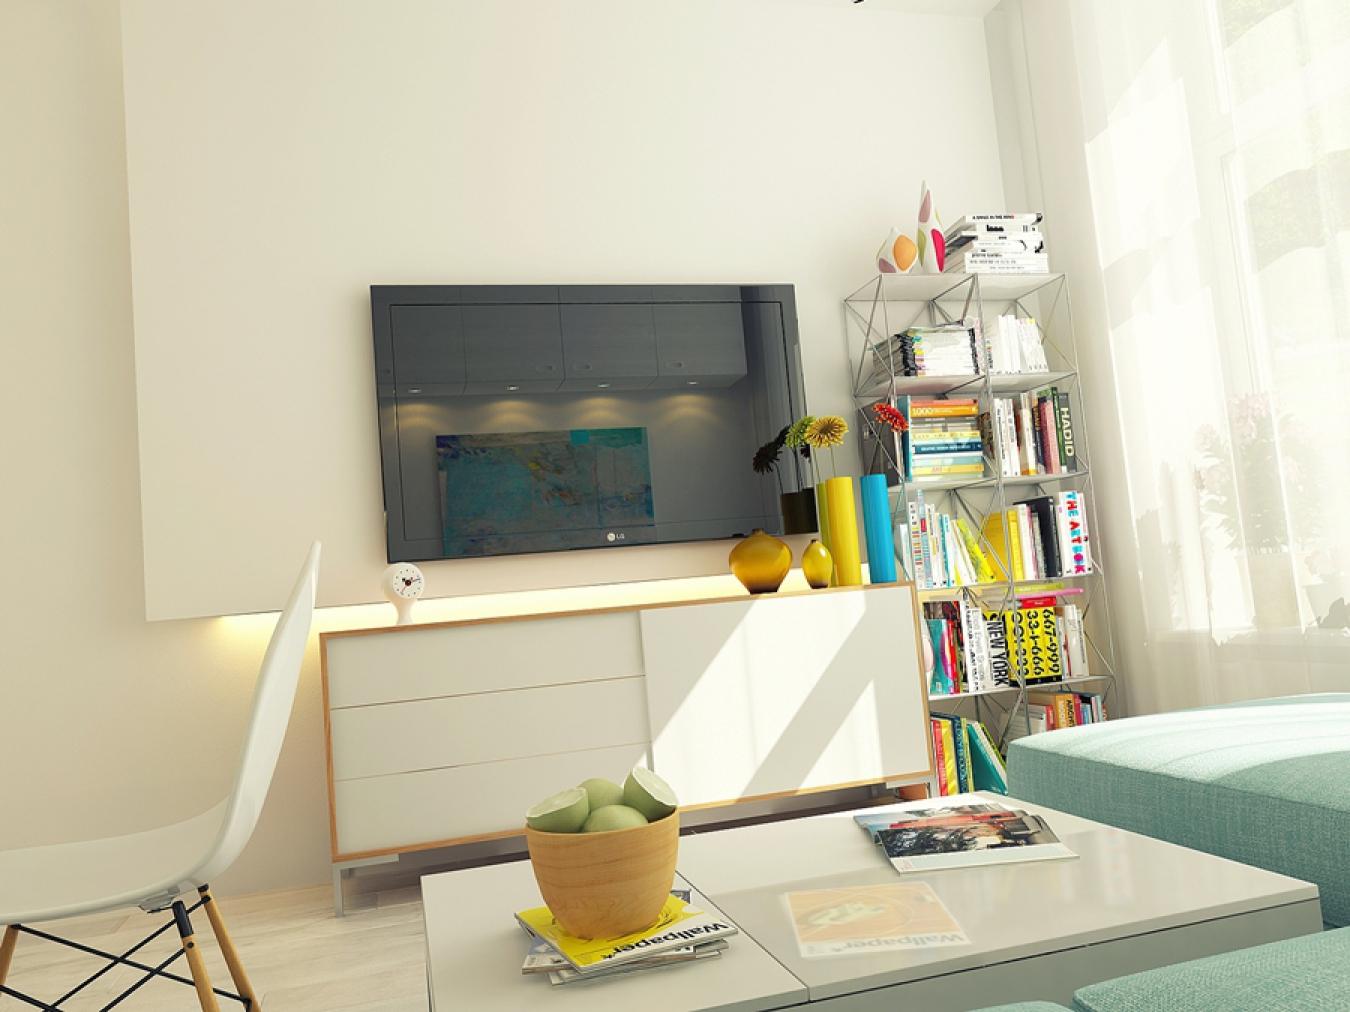 Однокомнатная квартира дизайн 29 квм